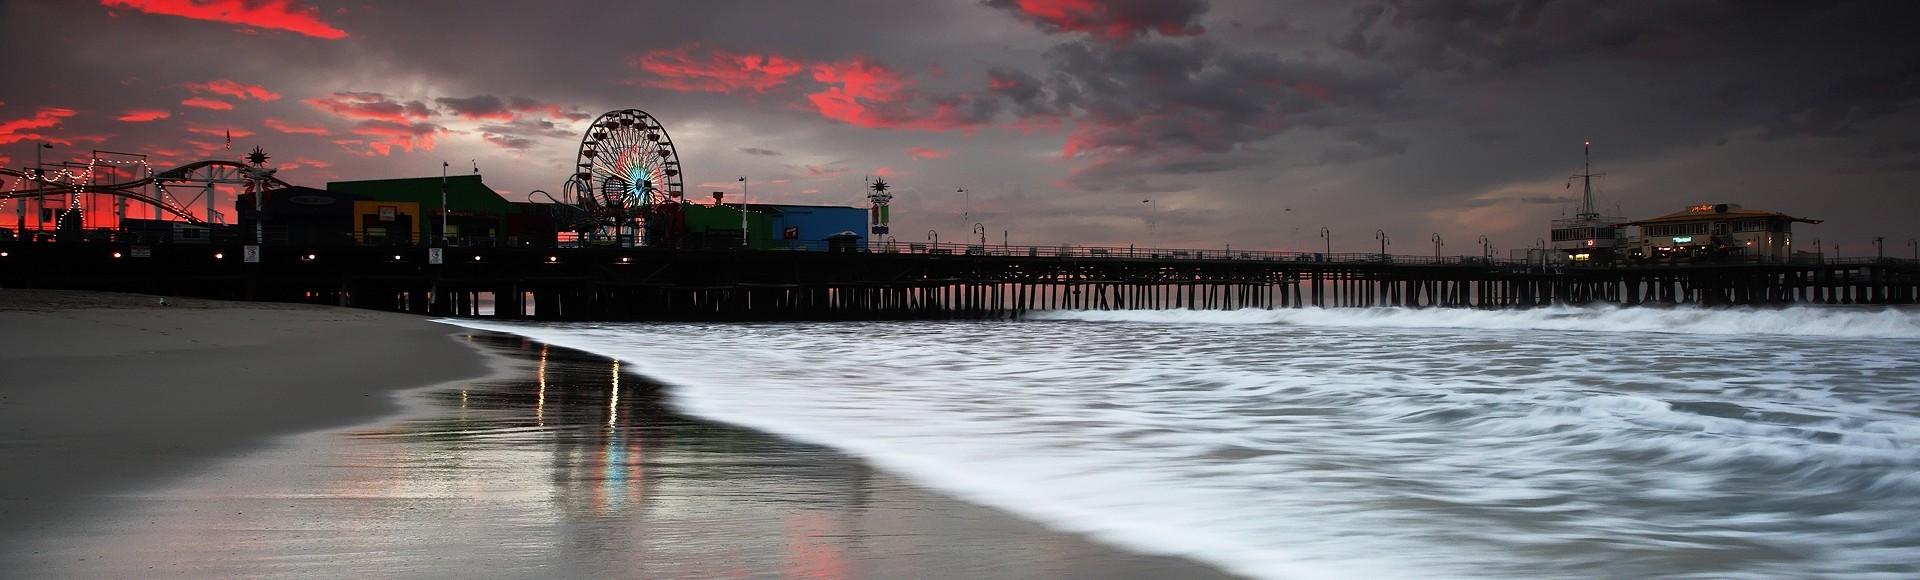 santa monica pier at sunrise